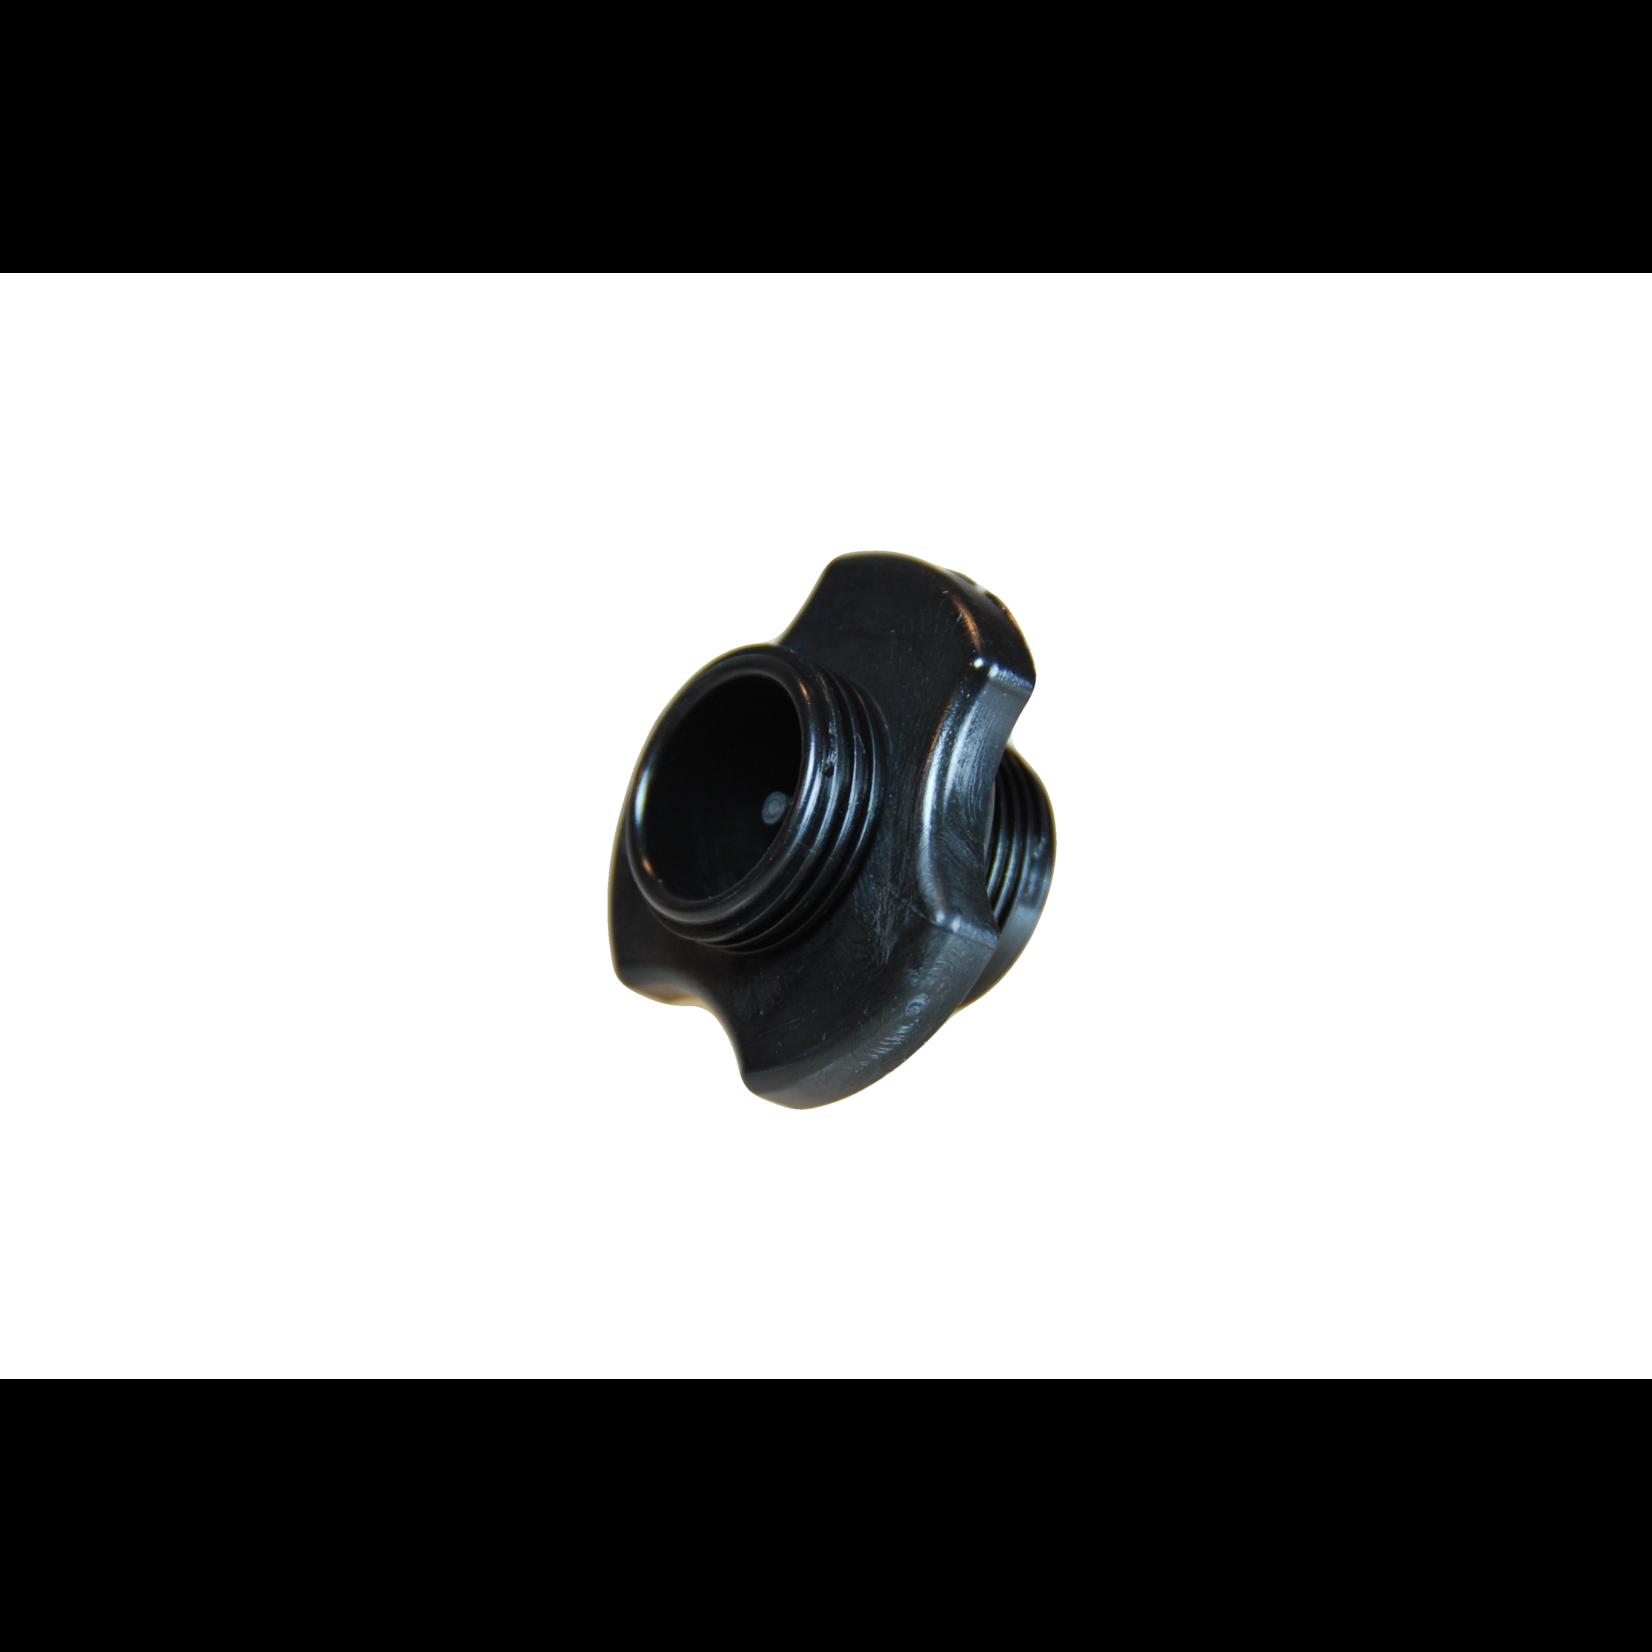 Zodiac Delrin valve and cap black